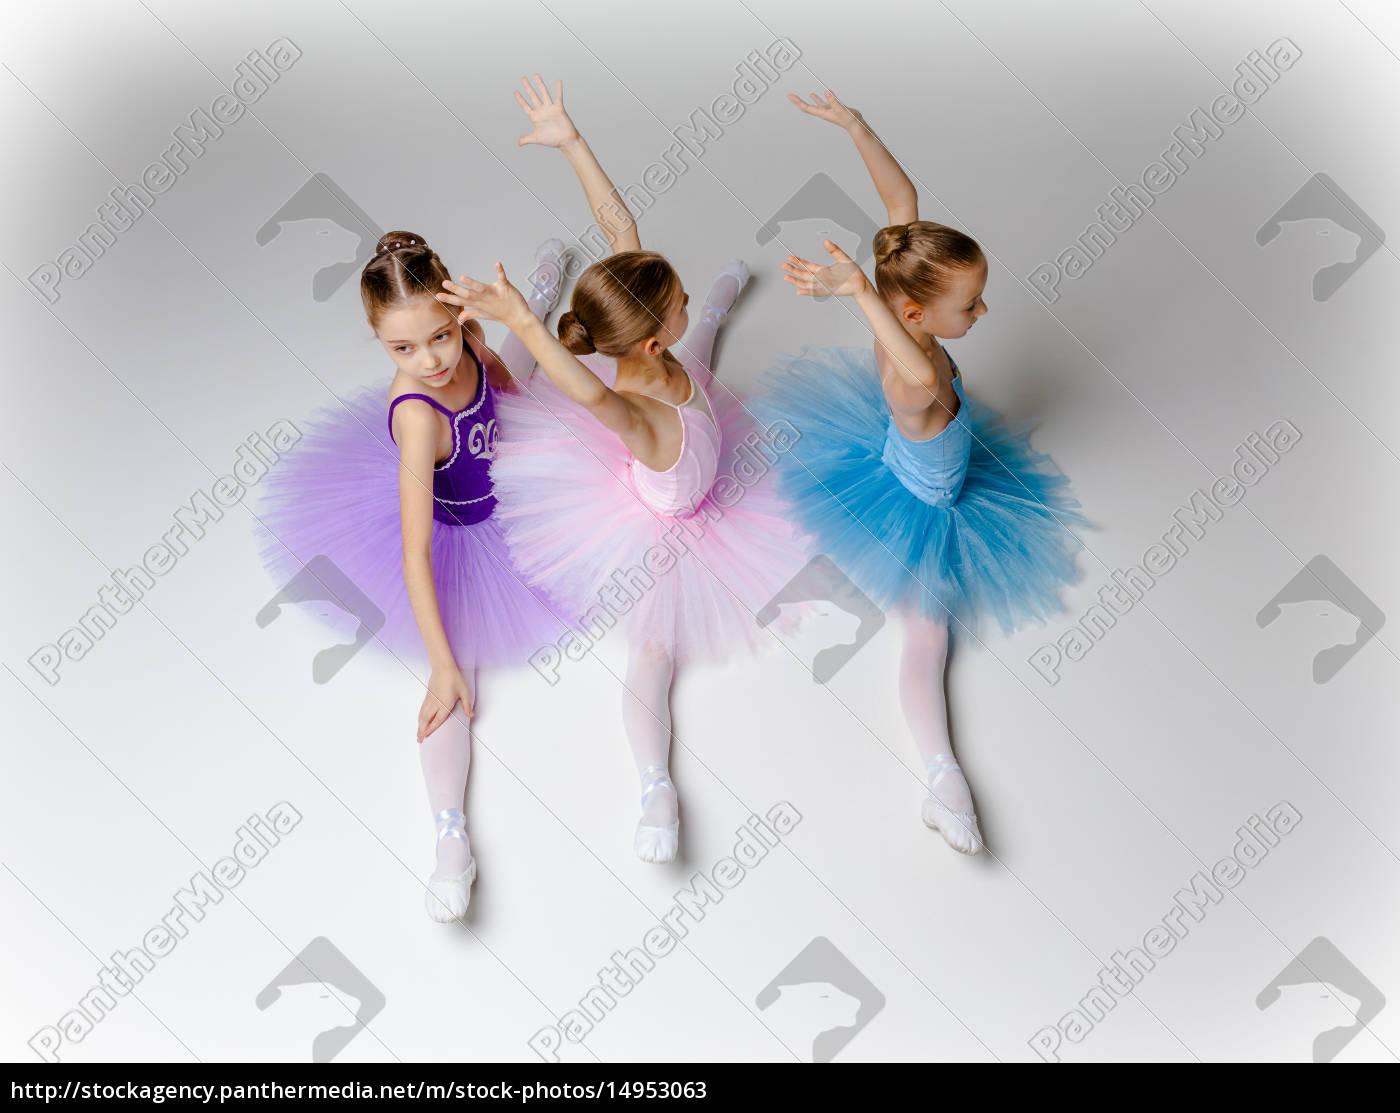 ballet, girl, ballerina, child, dancer, young - 14953063